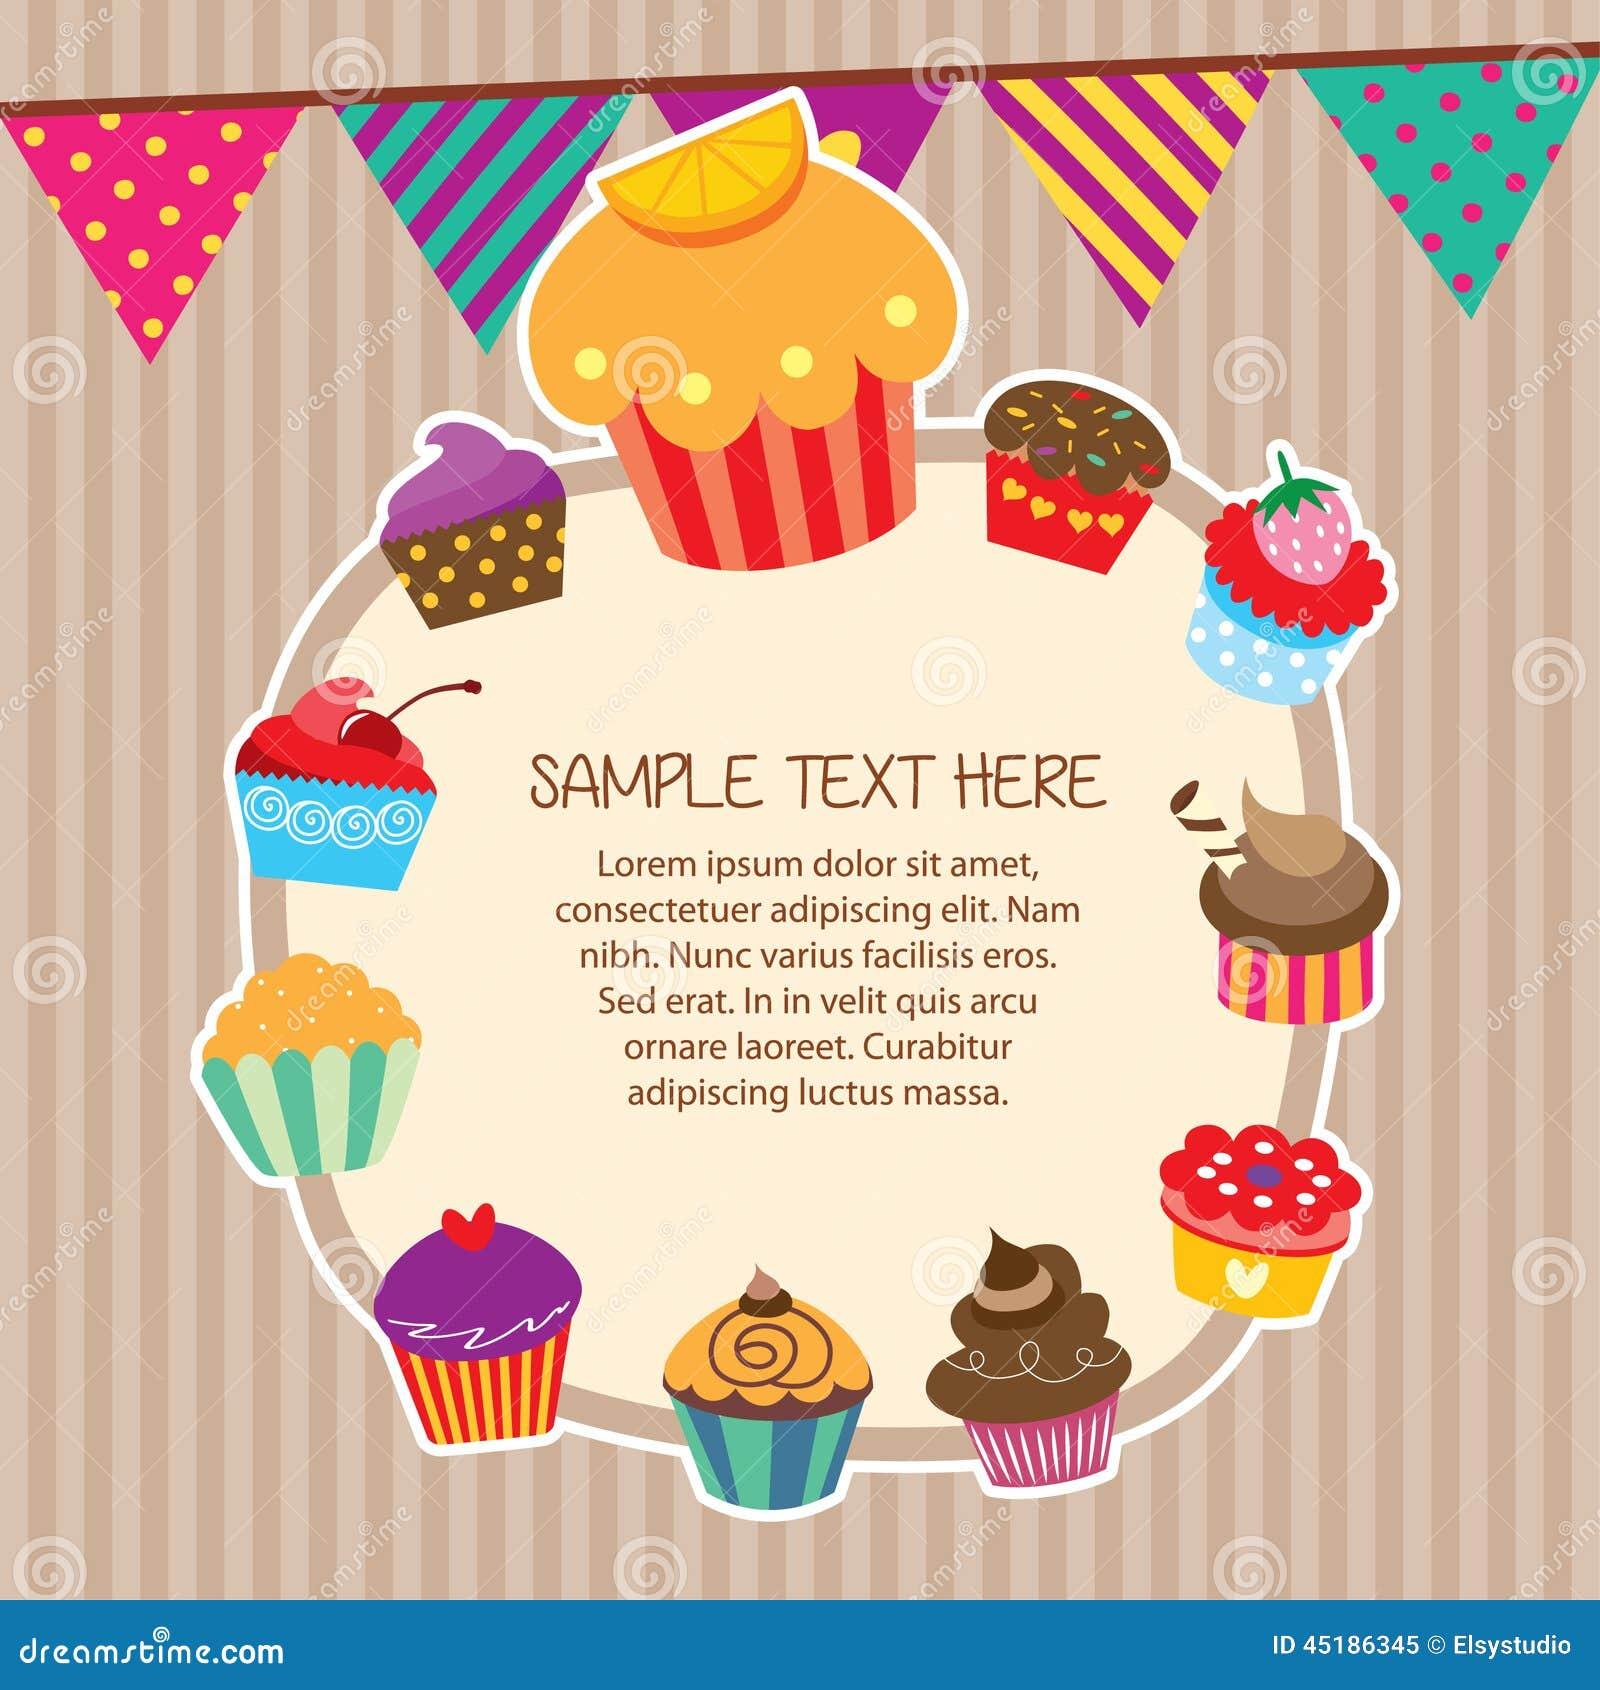 Cupcake Layout Frames Design Stock Vector - Image: 45186345